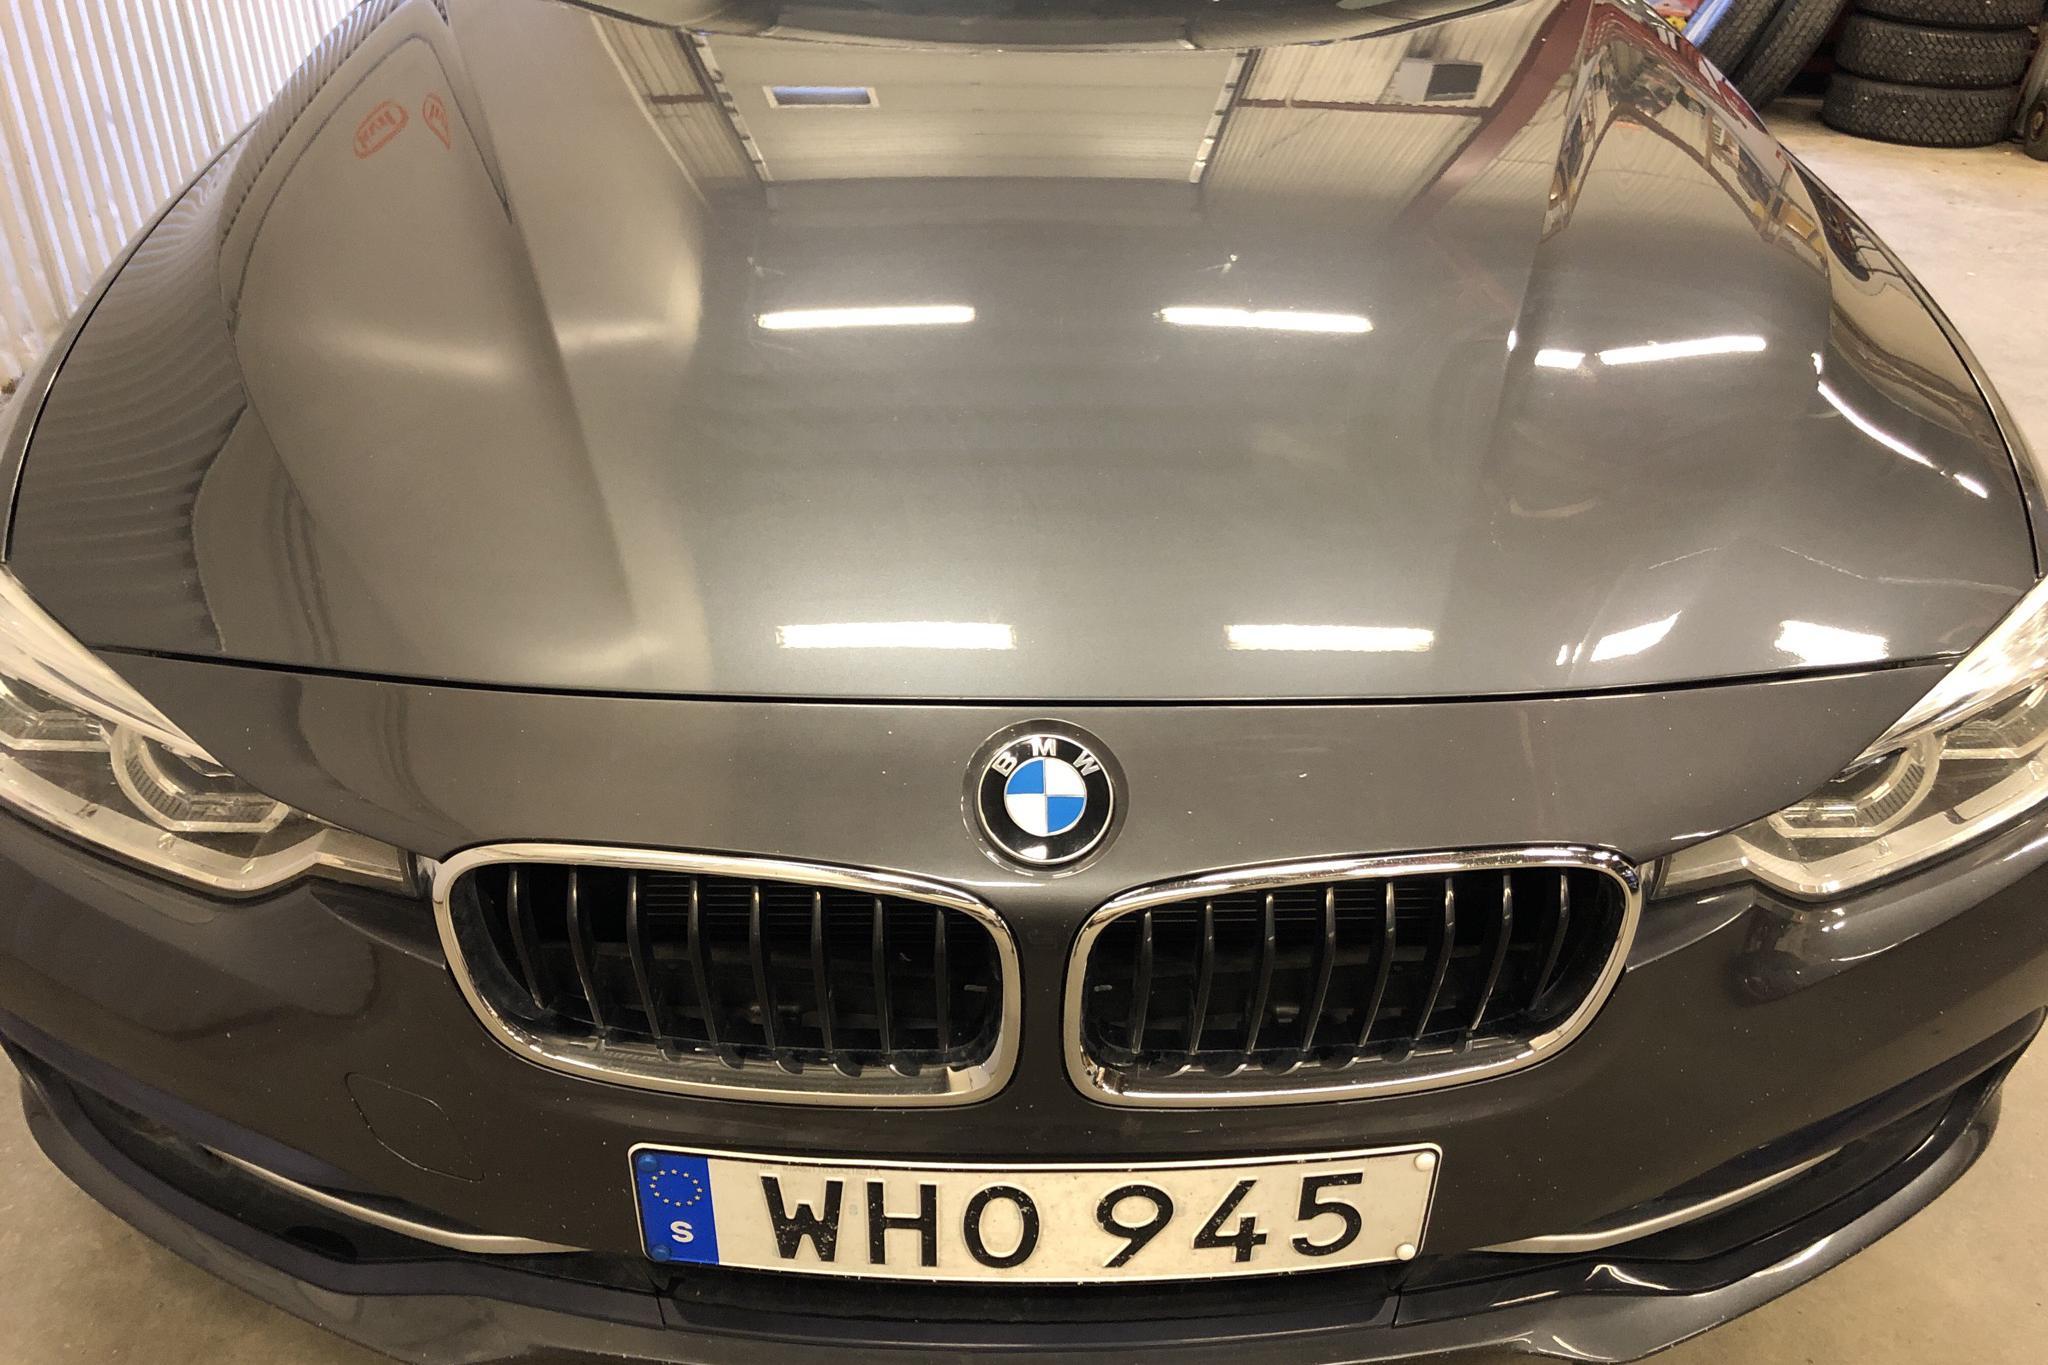 BMW 320d xDrive Touring, F31 (190hk) - 4 691 mil - Automat - grå - 2018